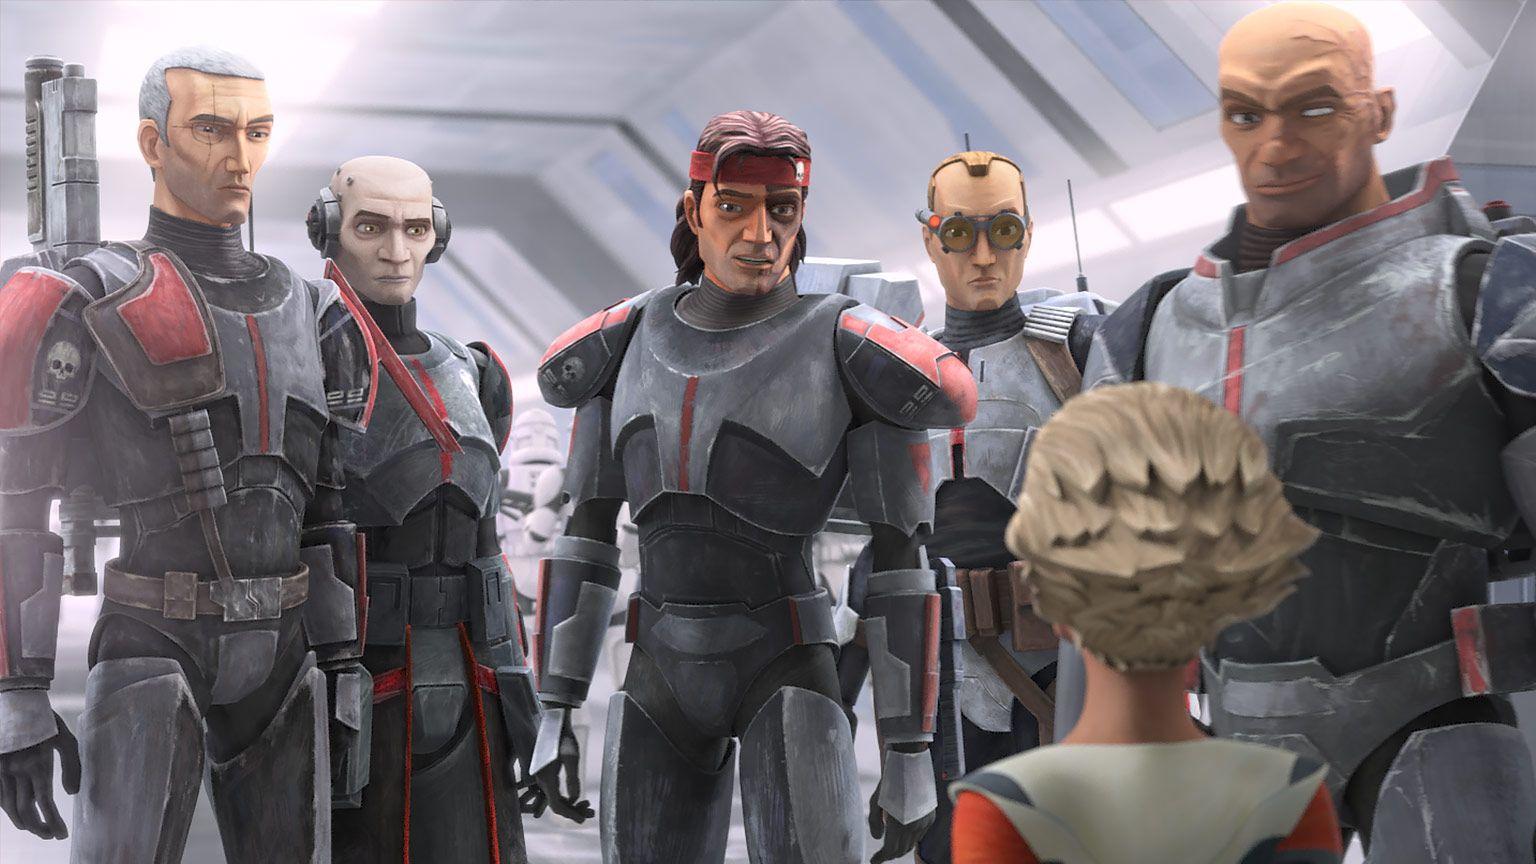 Star Wars: The Bad Batch (Image: starwars.com)